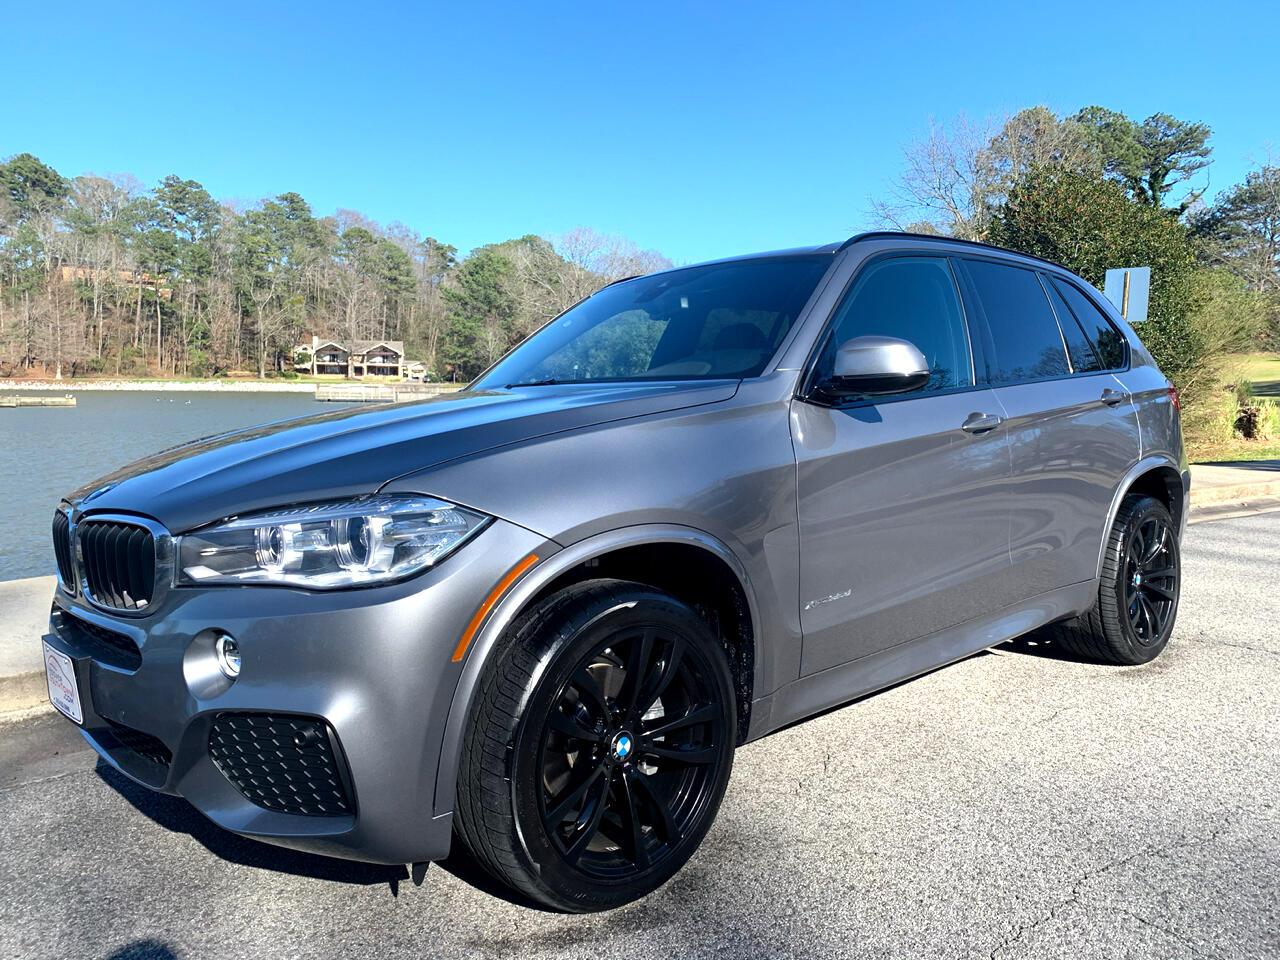 BMW X5 xDrive35d Sports Activity Vehicle 2016